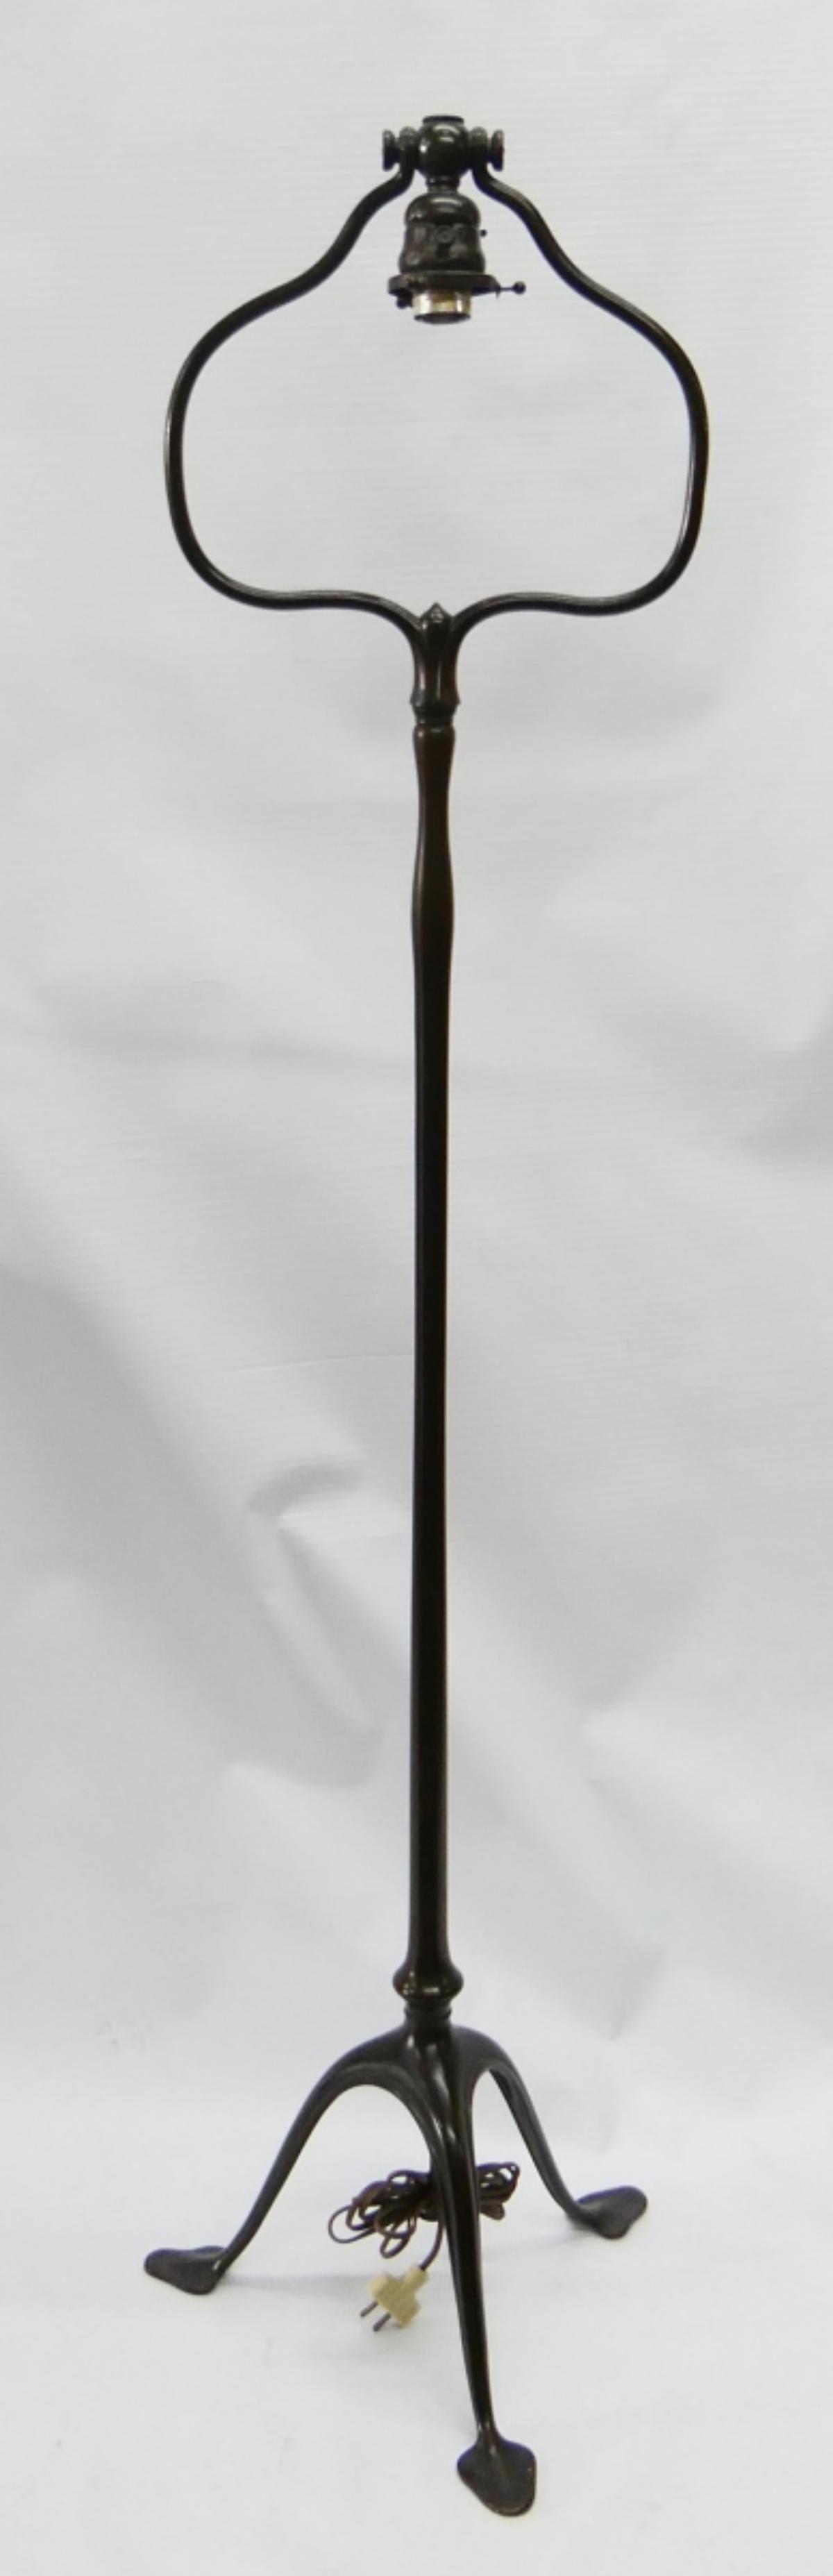 "ORIGINAL TIFFANY STUDIOS BRONZE 55"" FLOOR LAMP"